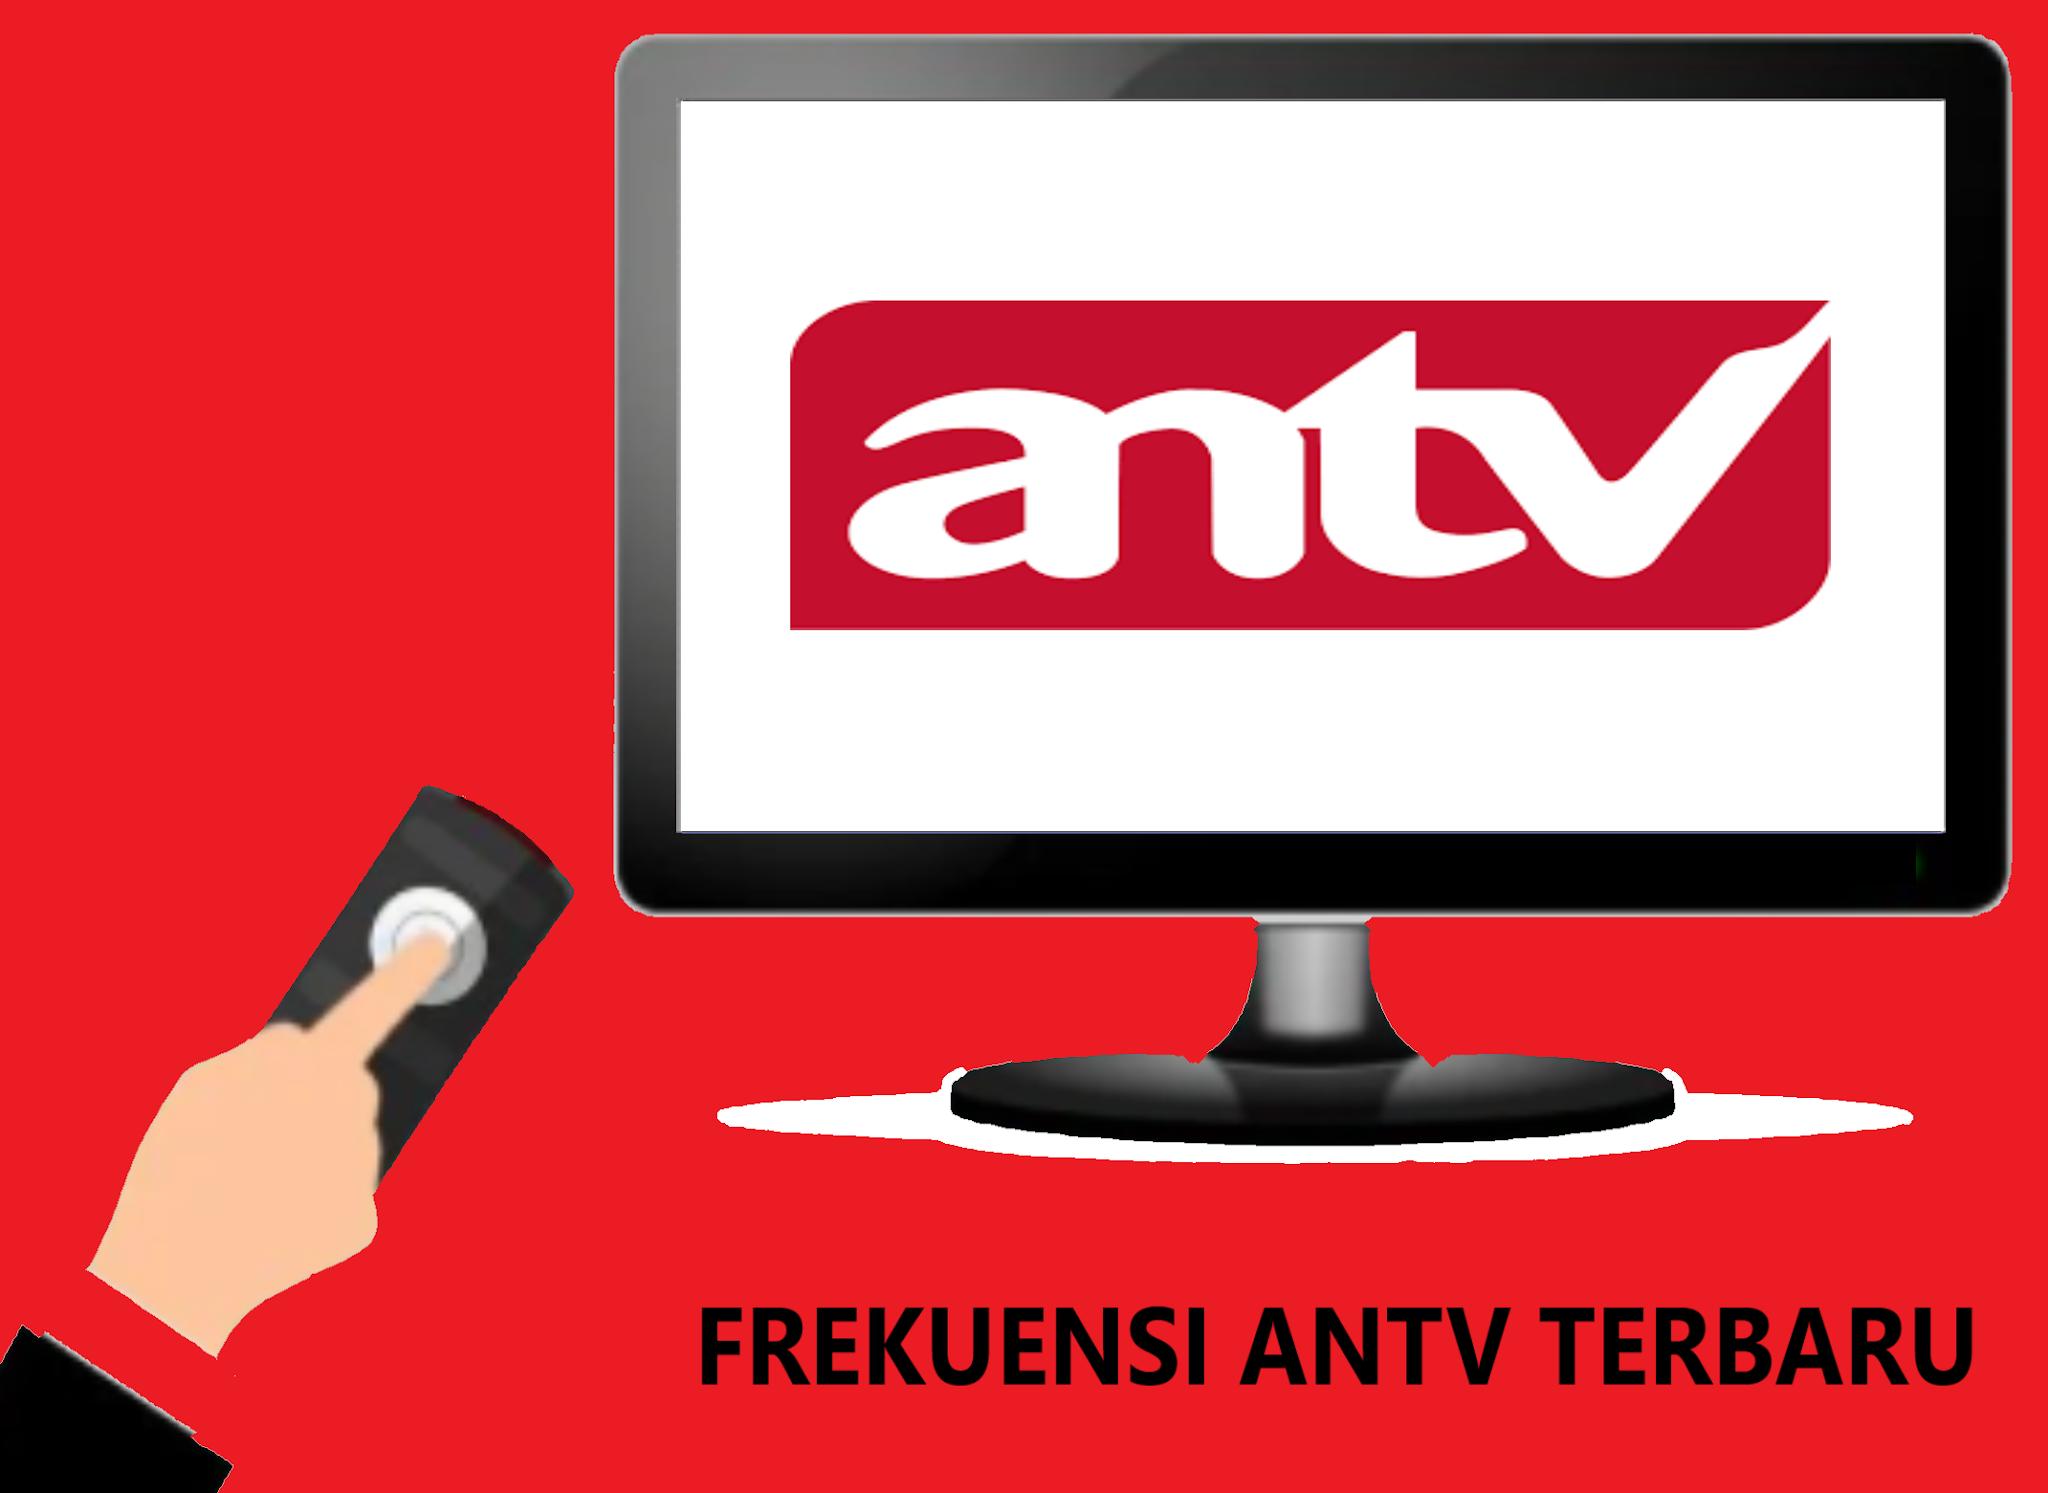 Frekuensi ANTV Terbaru Di Telkom 4 Update November 2020